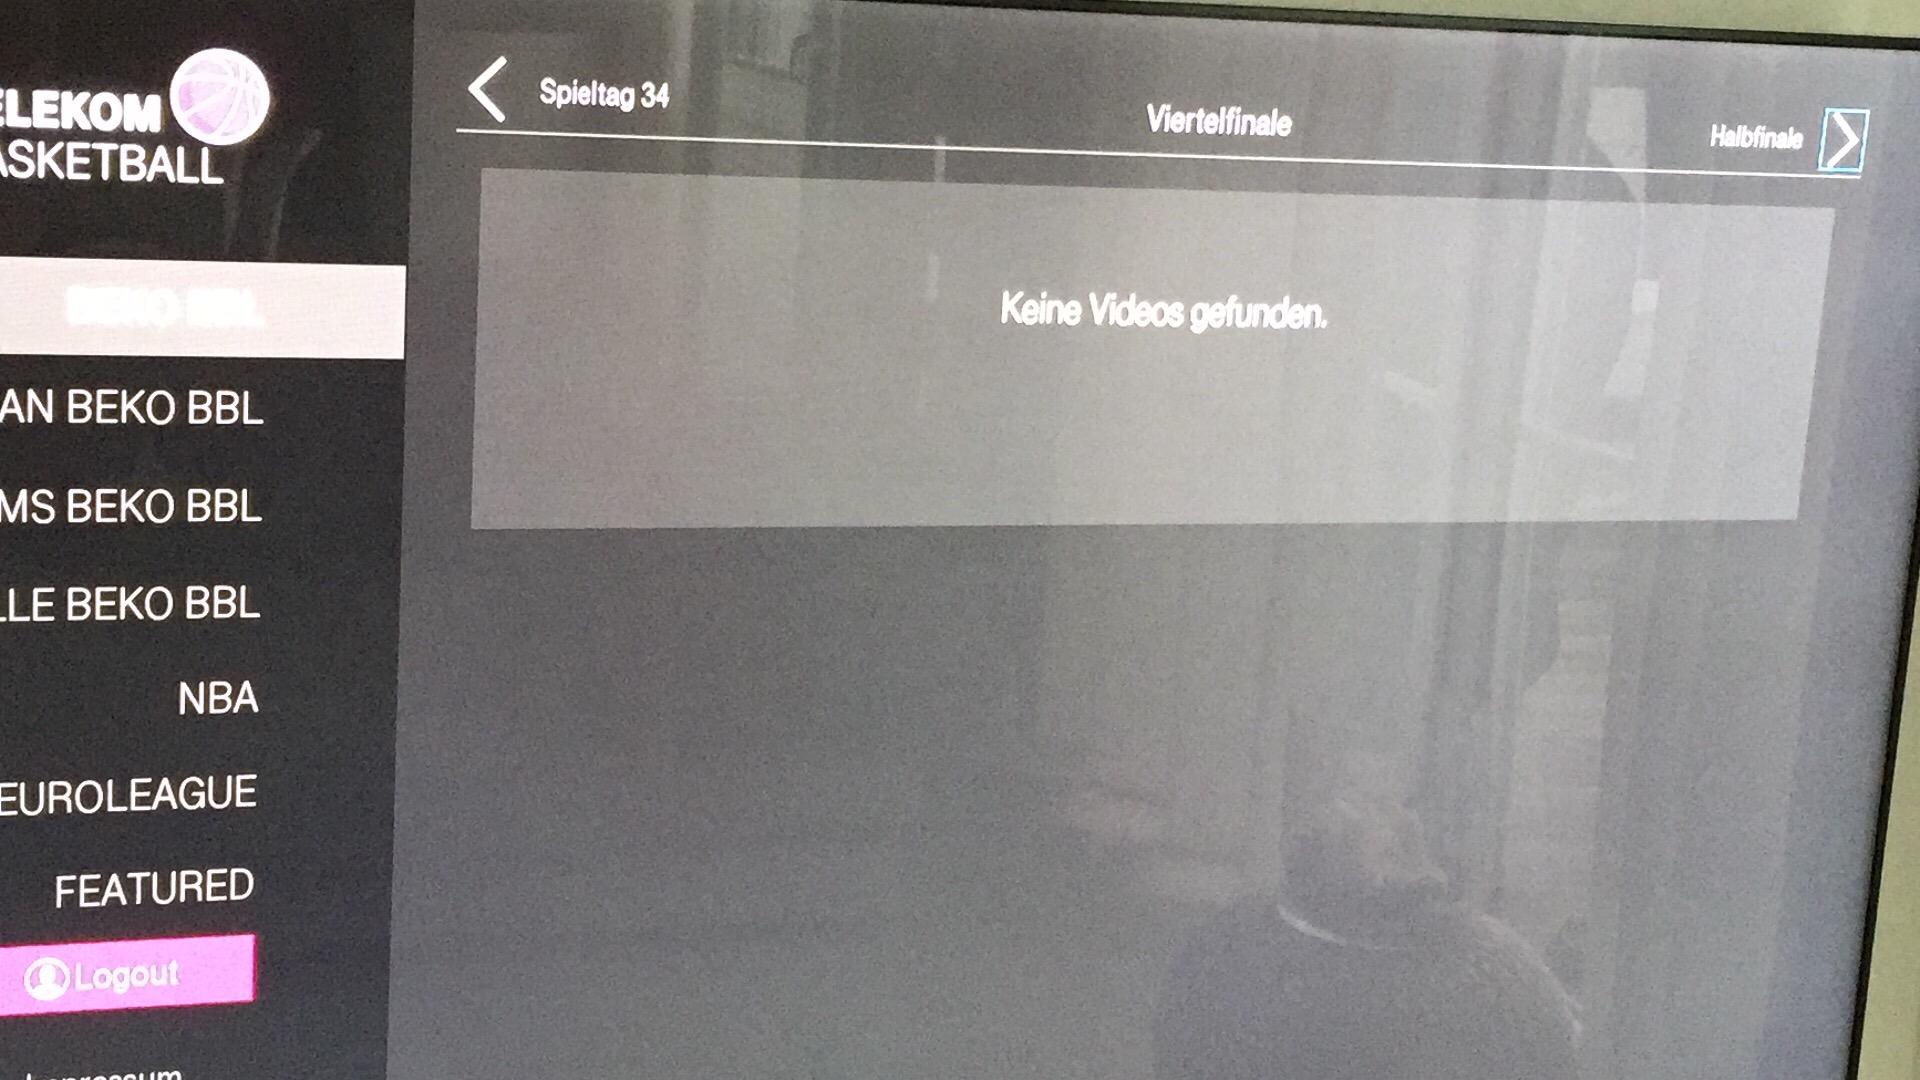 Community Telekom Basketball Samsung Tv Mit Smart App Playof